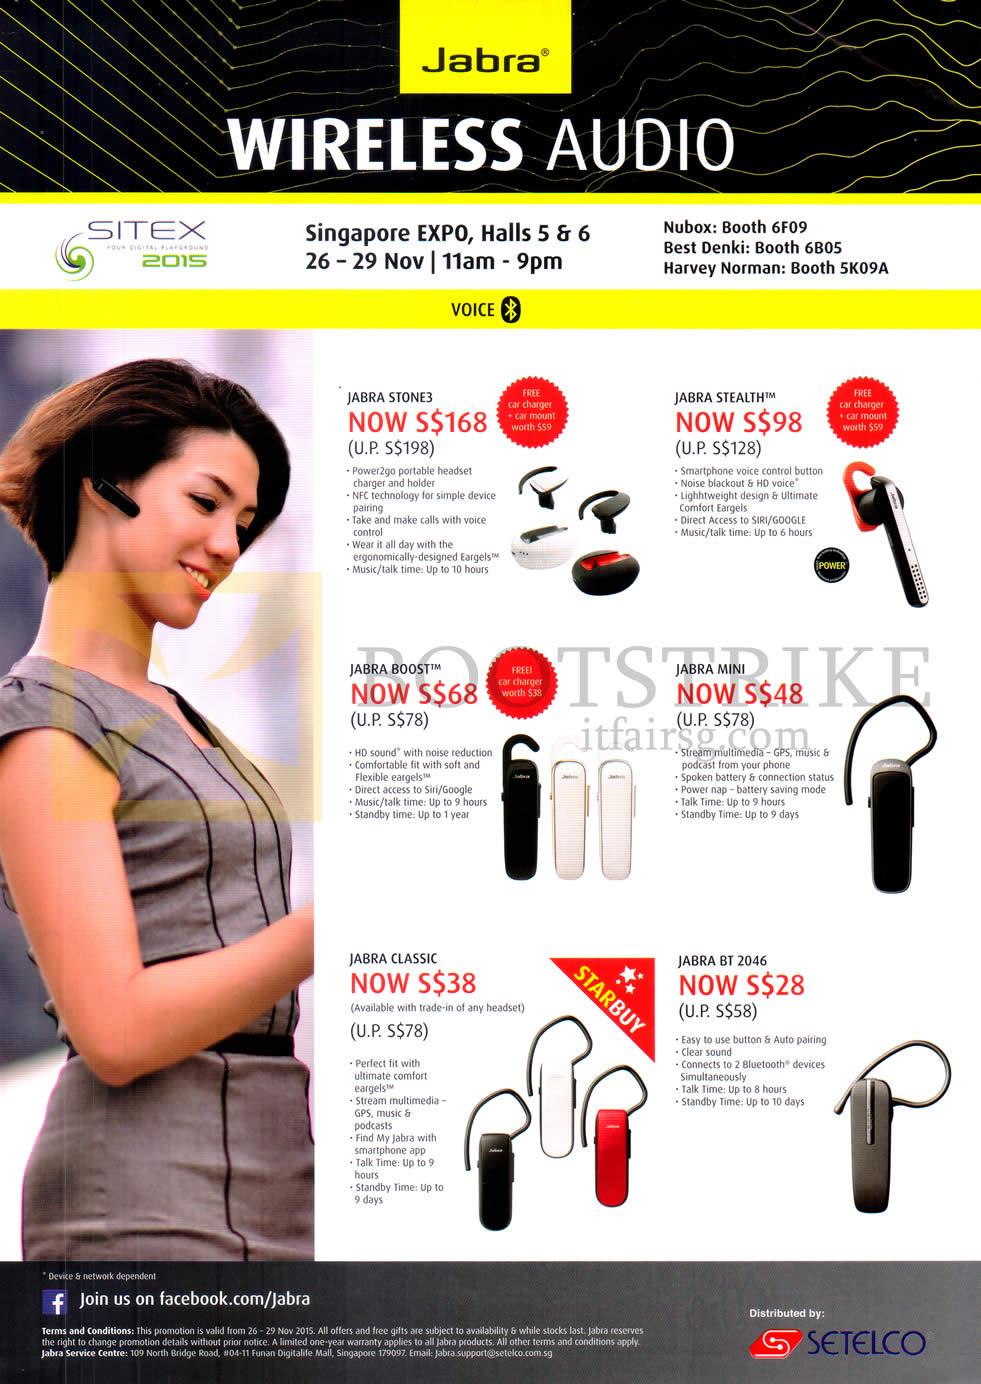 SITEX 2015 price list image brochure of Jabra Bluetooth Headsets Wireless Audio Jabra Stone3, Stealth, Boost, Mini, Classic, BT 2046